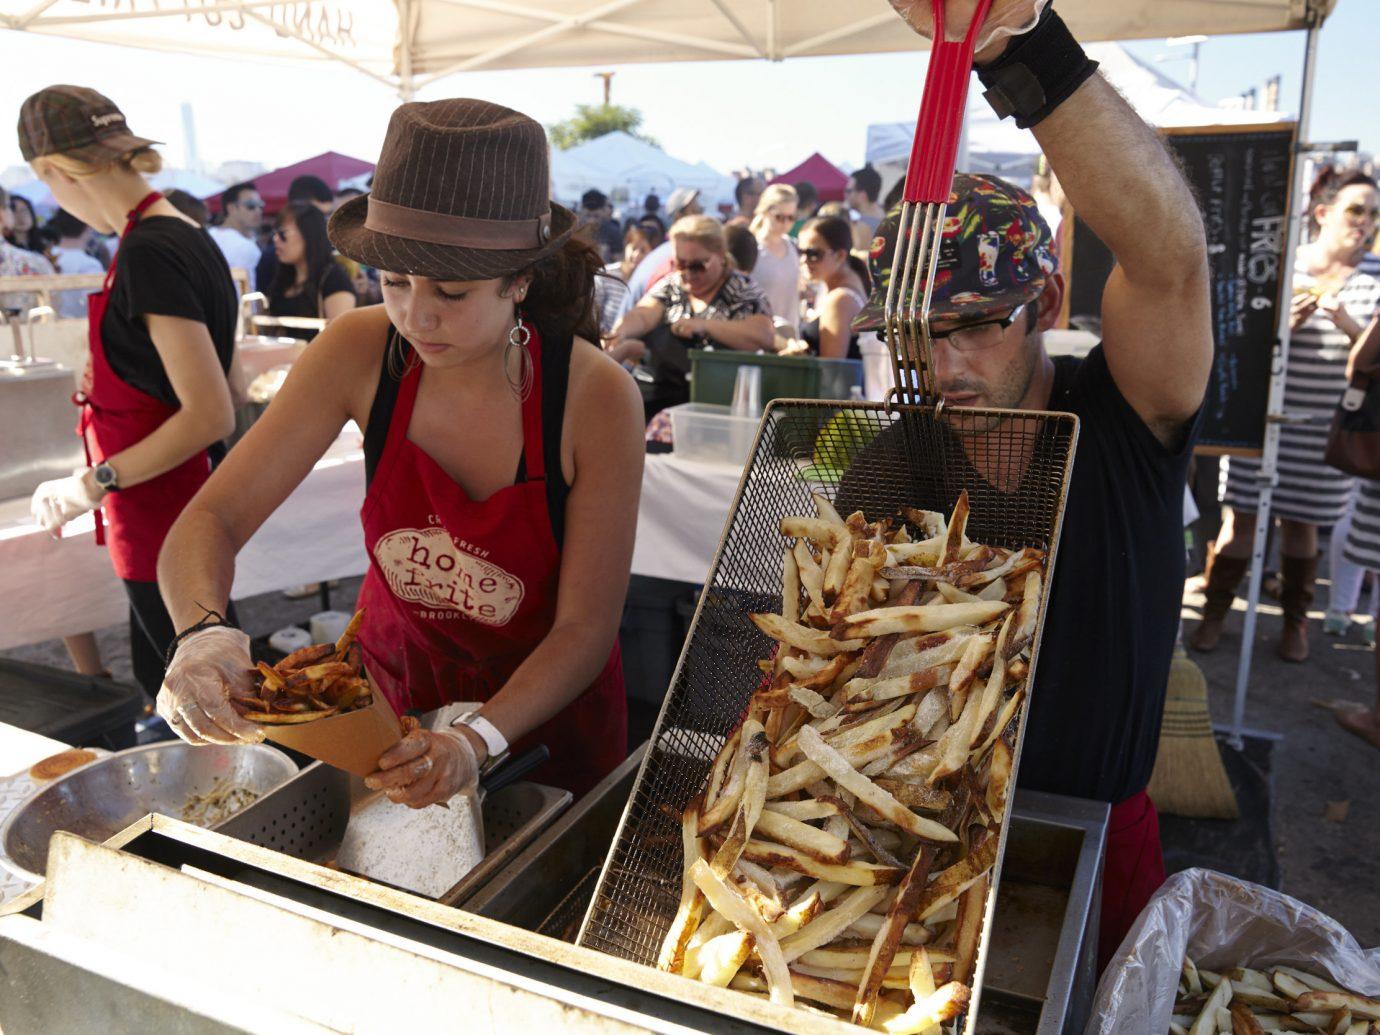 Budget person crowd public space City market vendor human settlement street food food fair sense festival taste preparing